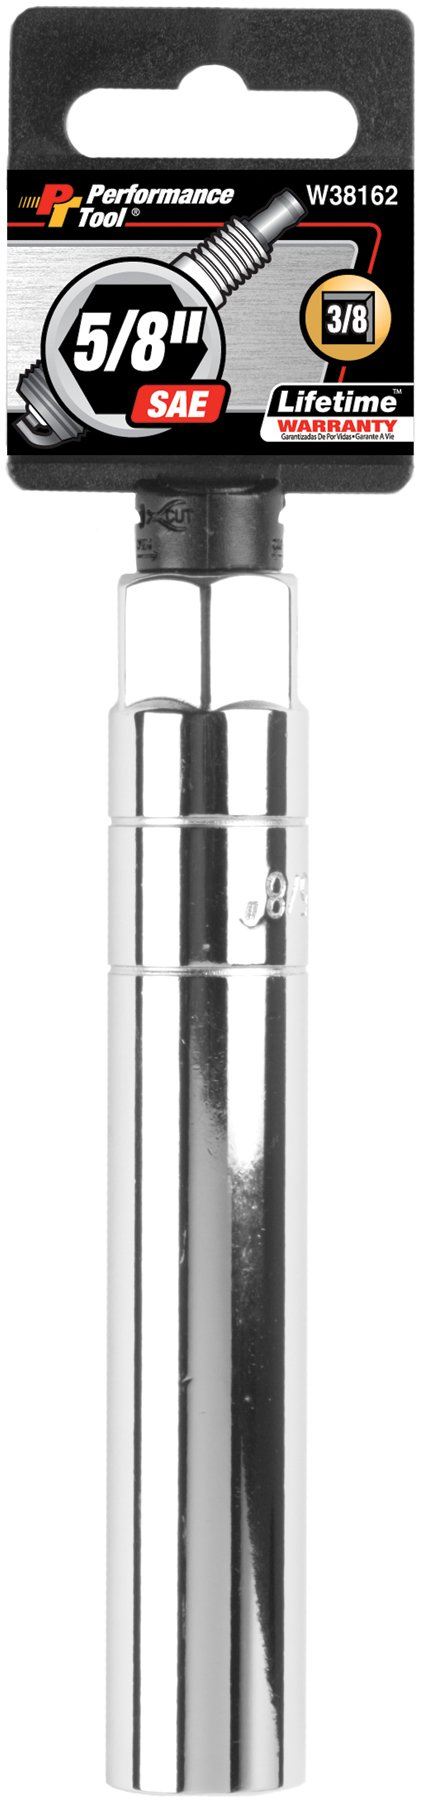 Performance Tool W38162 3/8'' Dr 5/8'' Extra Long Spark Plug Socket